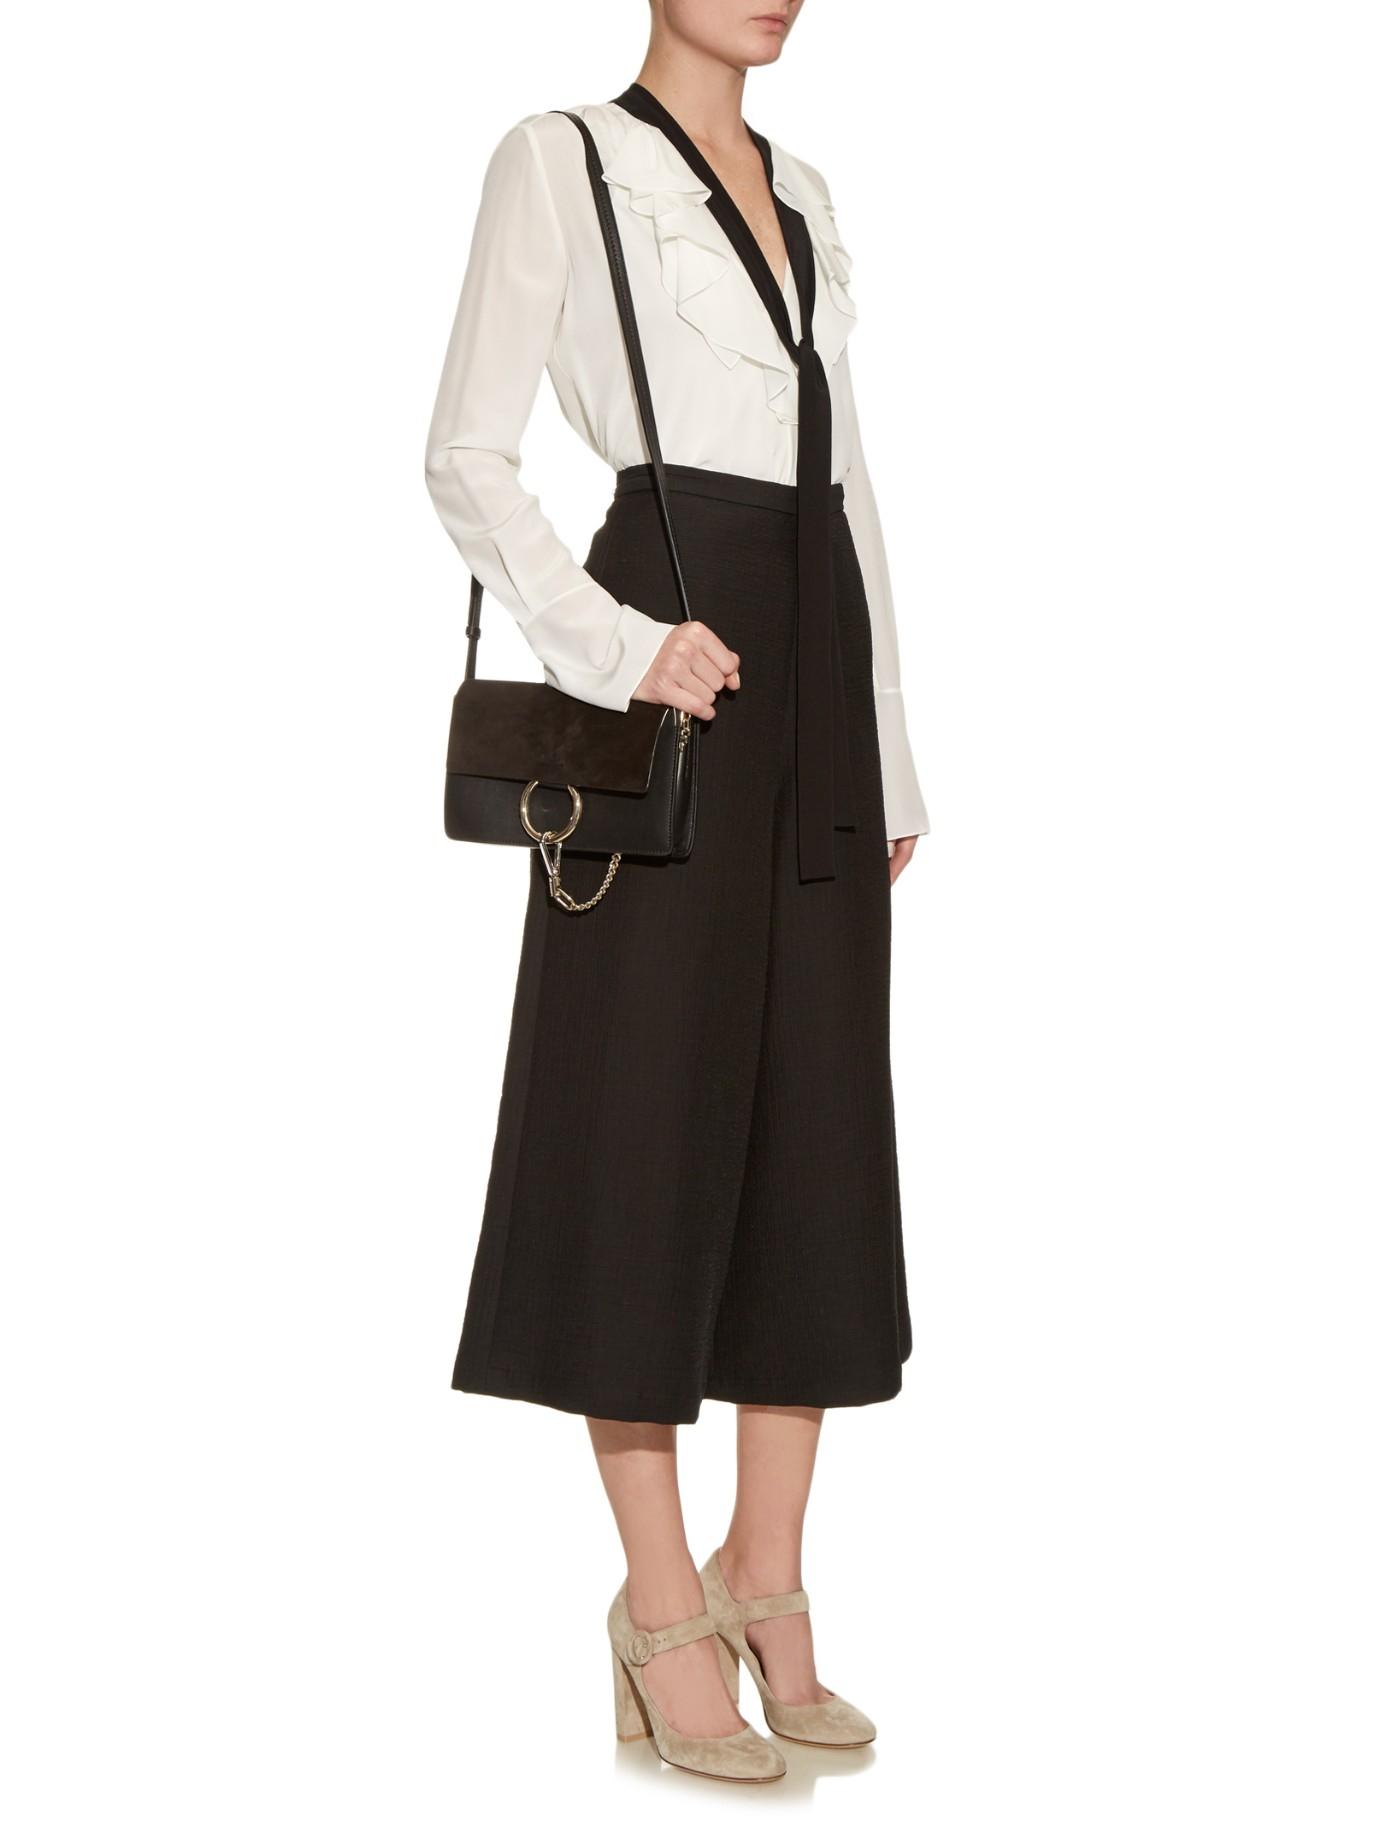 Lyst - Chloé Faye Small Leather And Suede Cross-body Bag in Black e52d93b49da3c